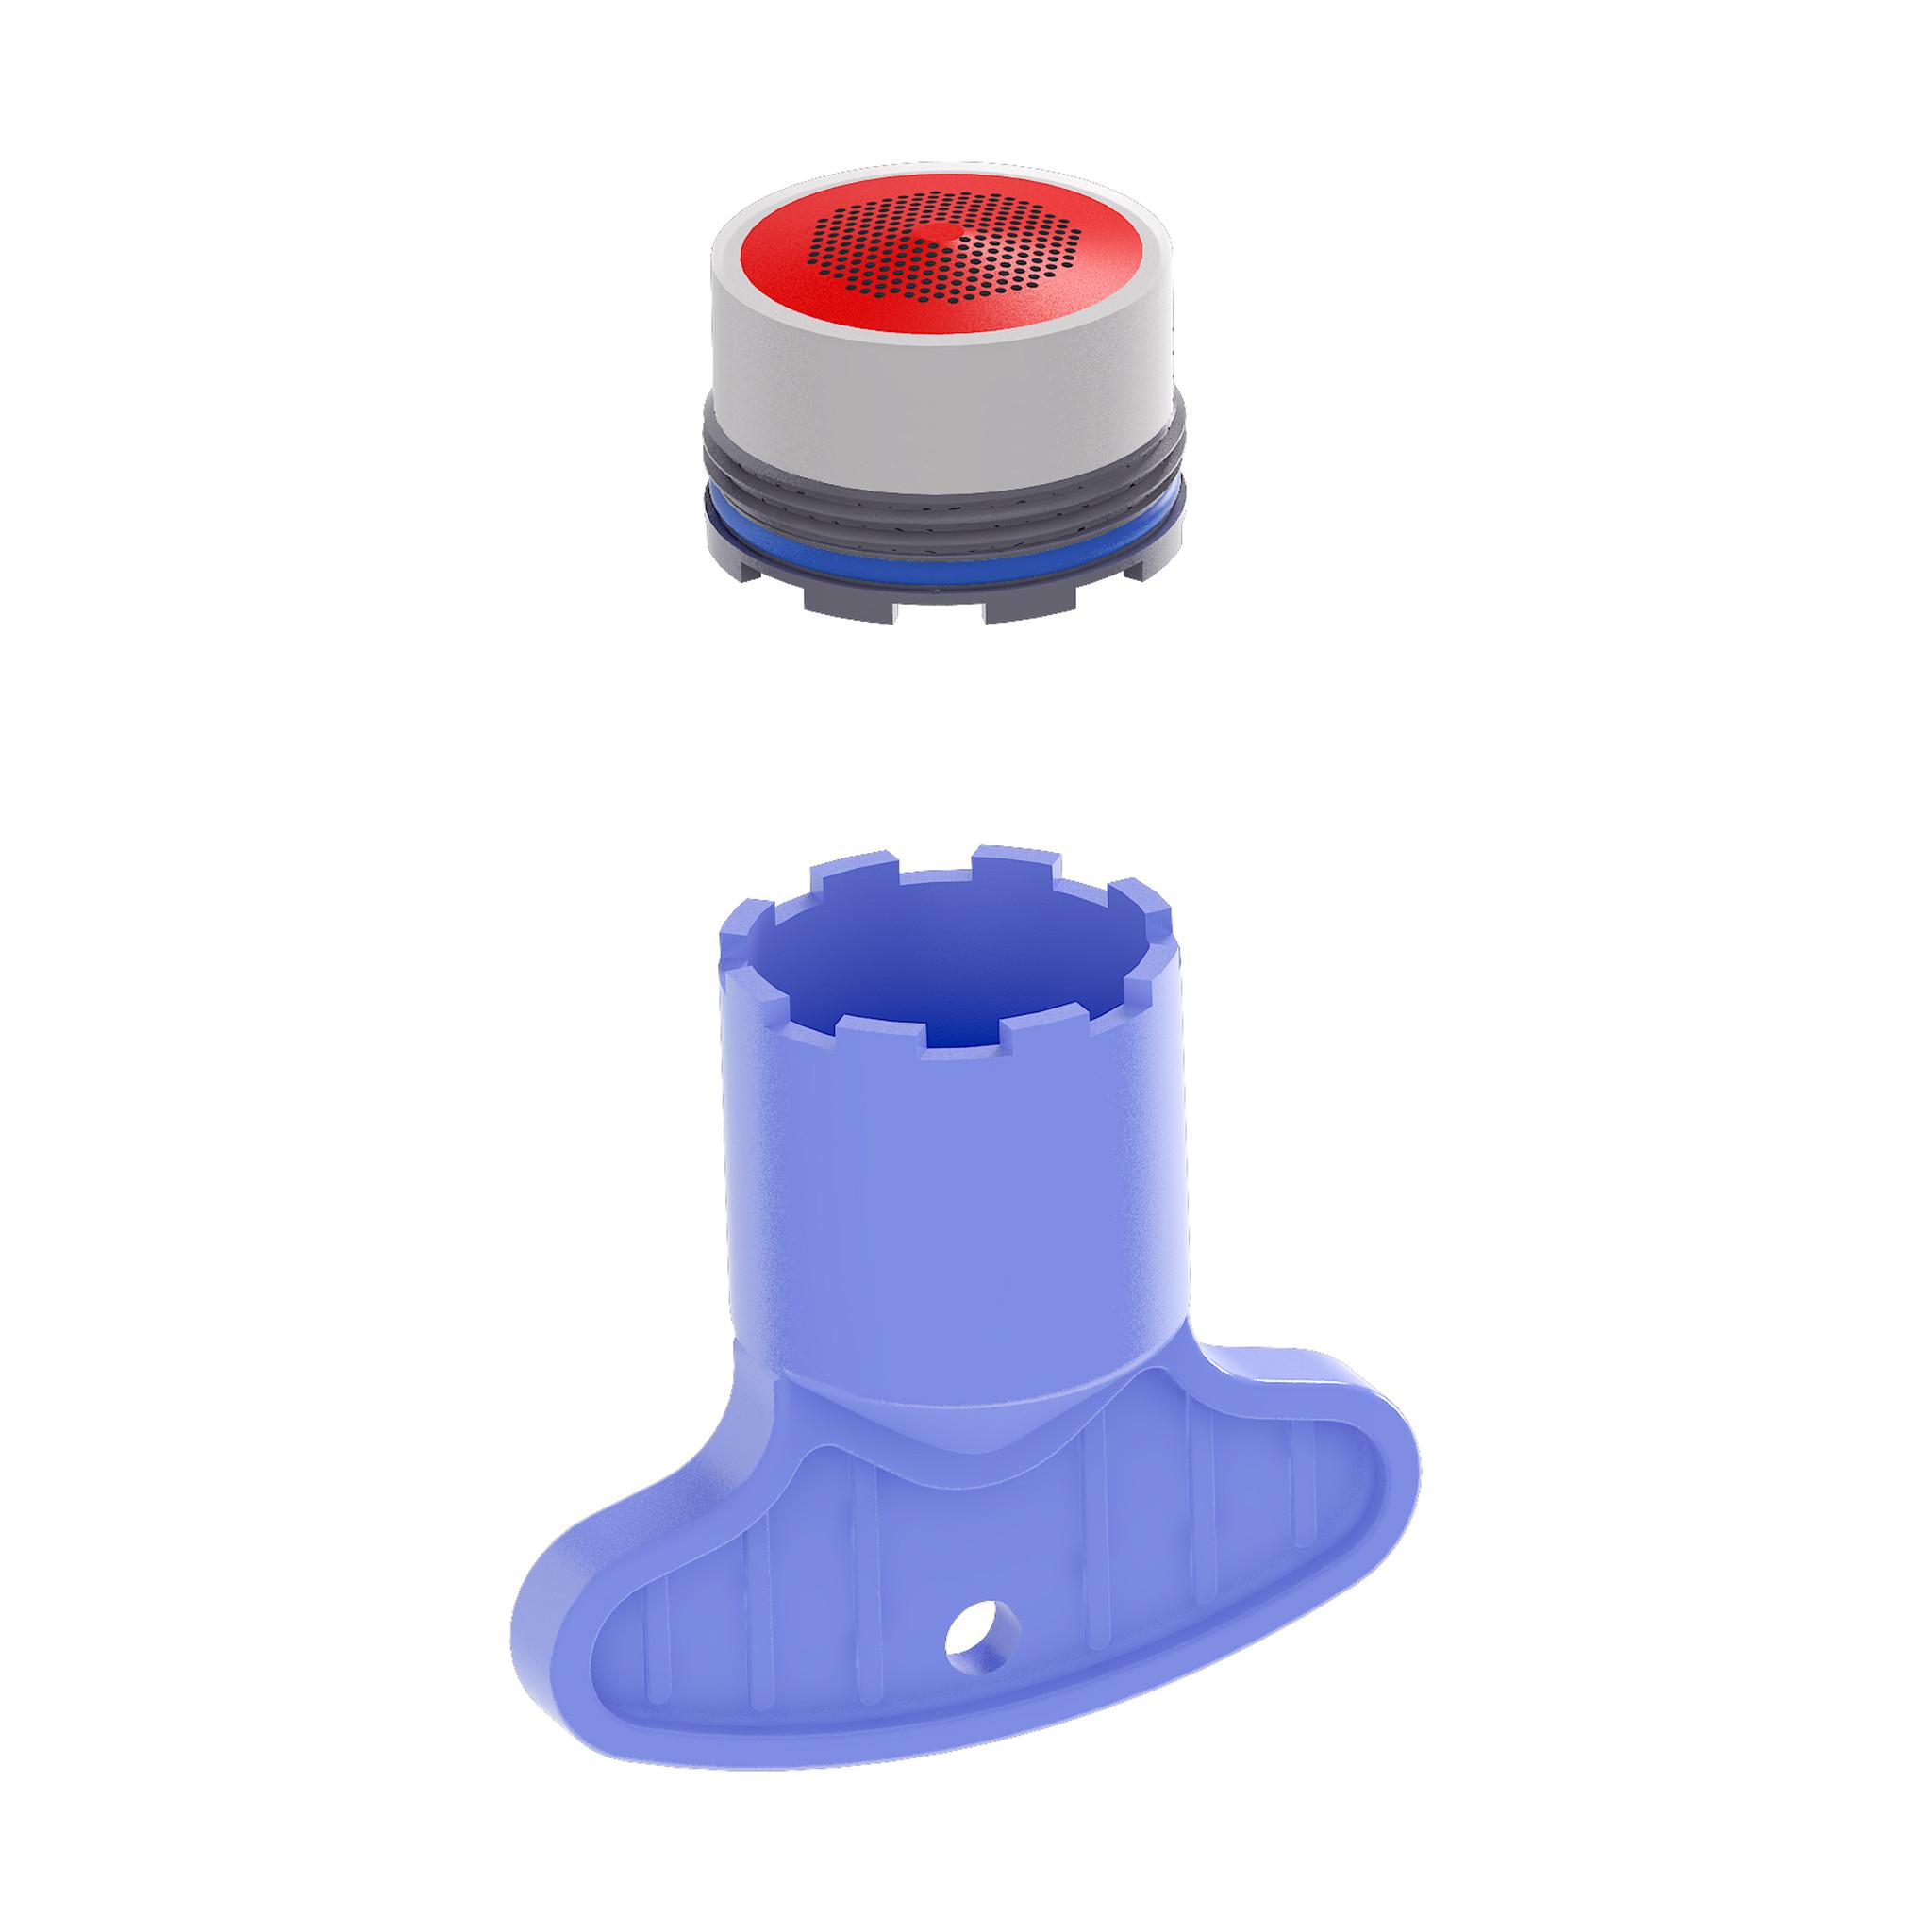 Kaldur Water breaker with key for Kaldur and Xo freestanding bathtub mixers CL/06.04012.29 and CL/06.04013.29